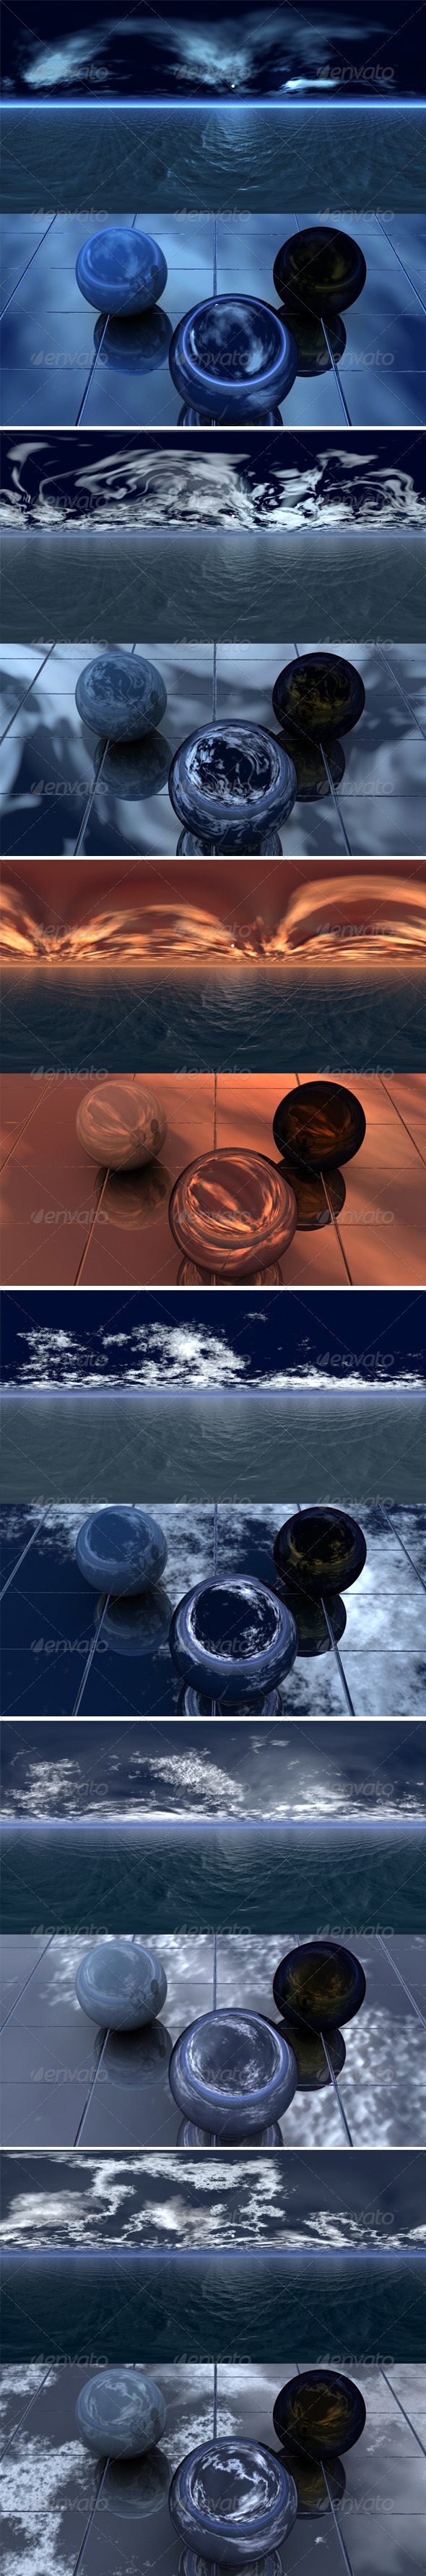 Night Sea - pack - 3DOcean Item for Sale